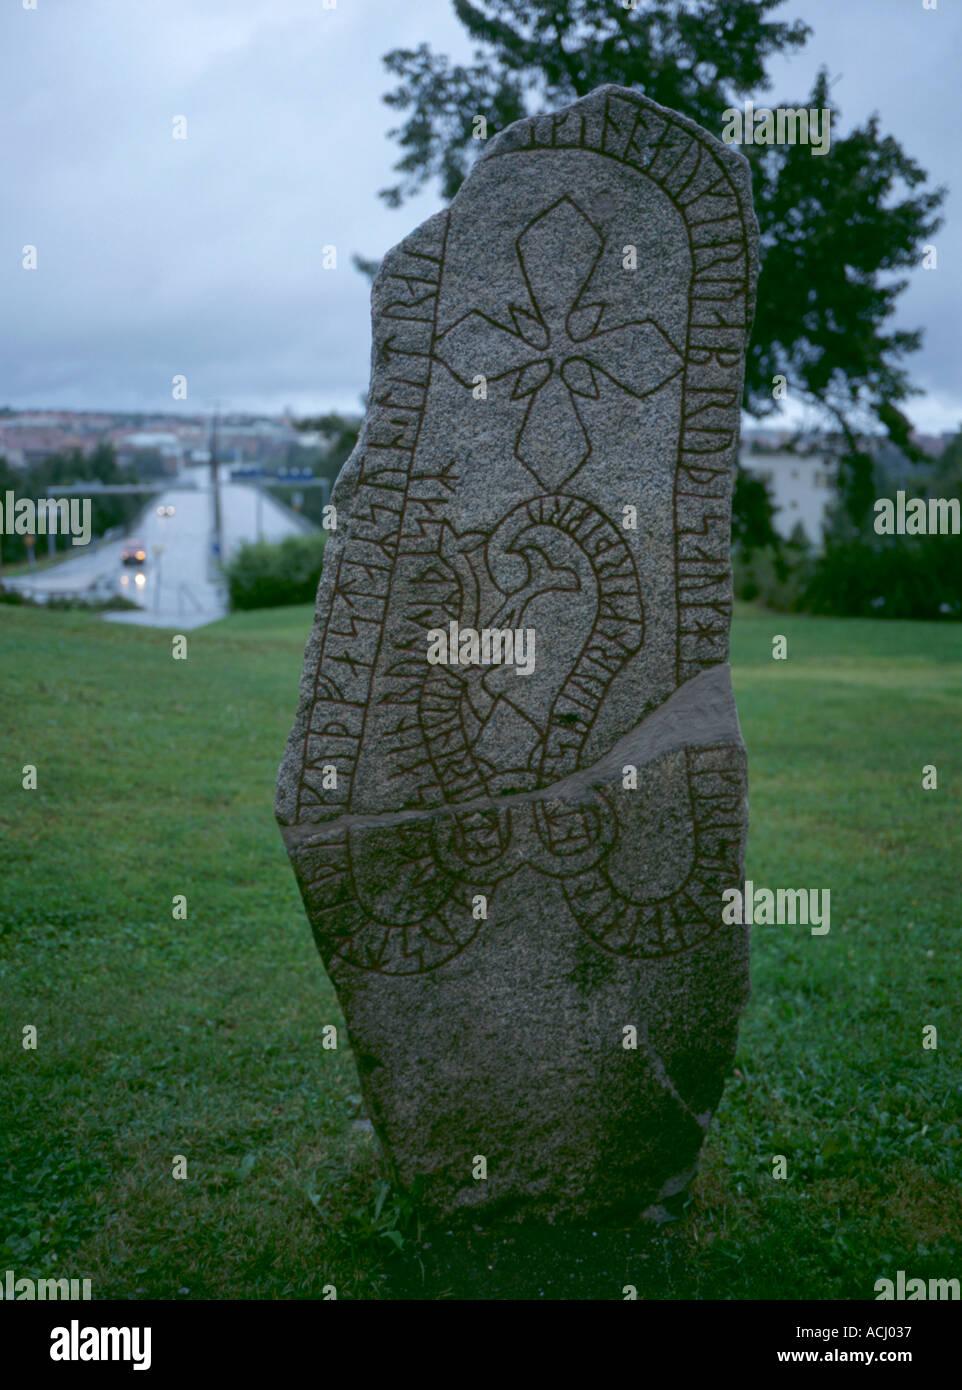 Most northerly rune stone in Sweden; on island of Frösön, Östersund, Jämtland, northern Sweden. - Stock Image